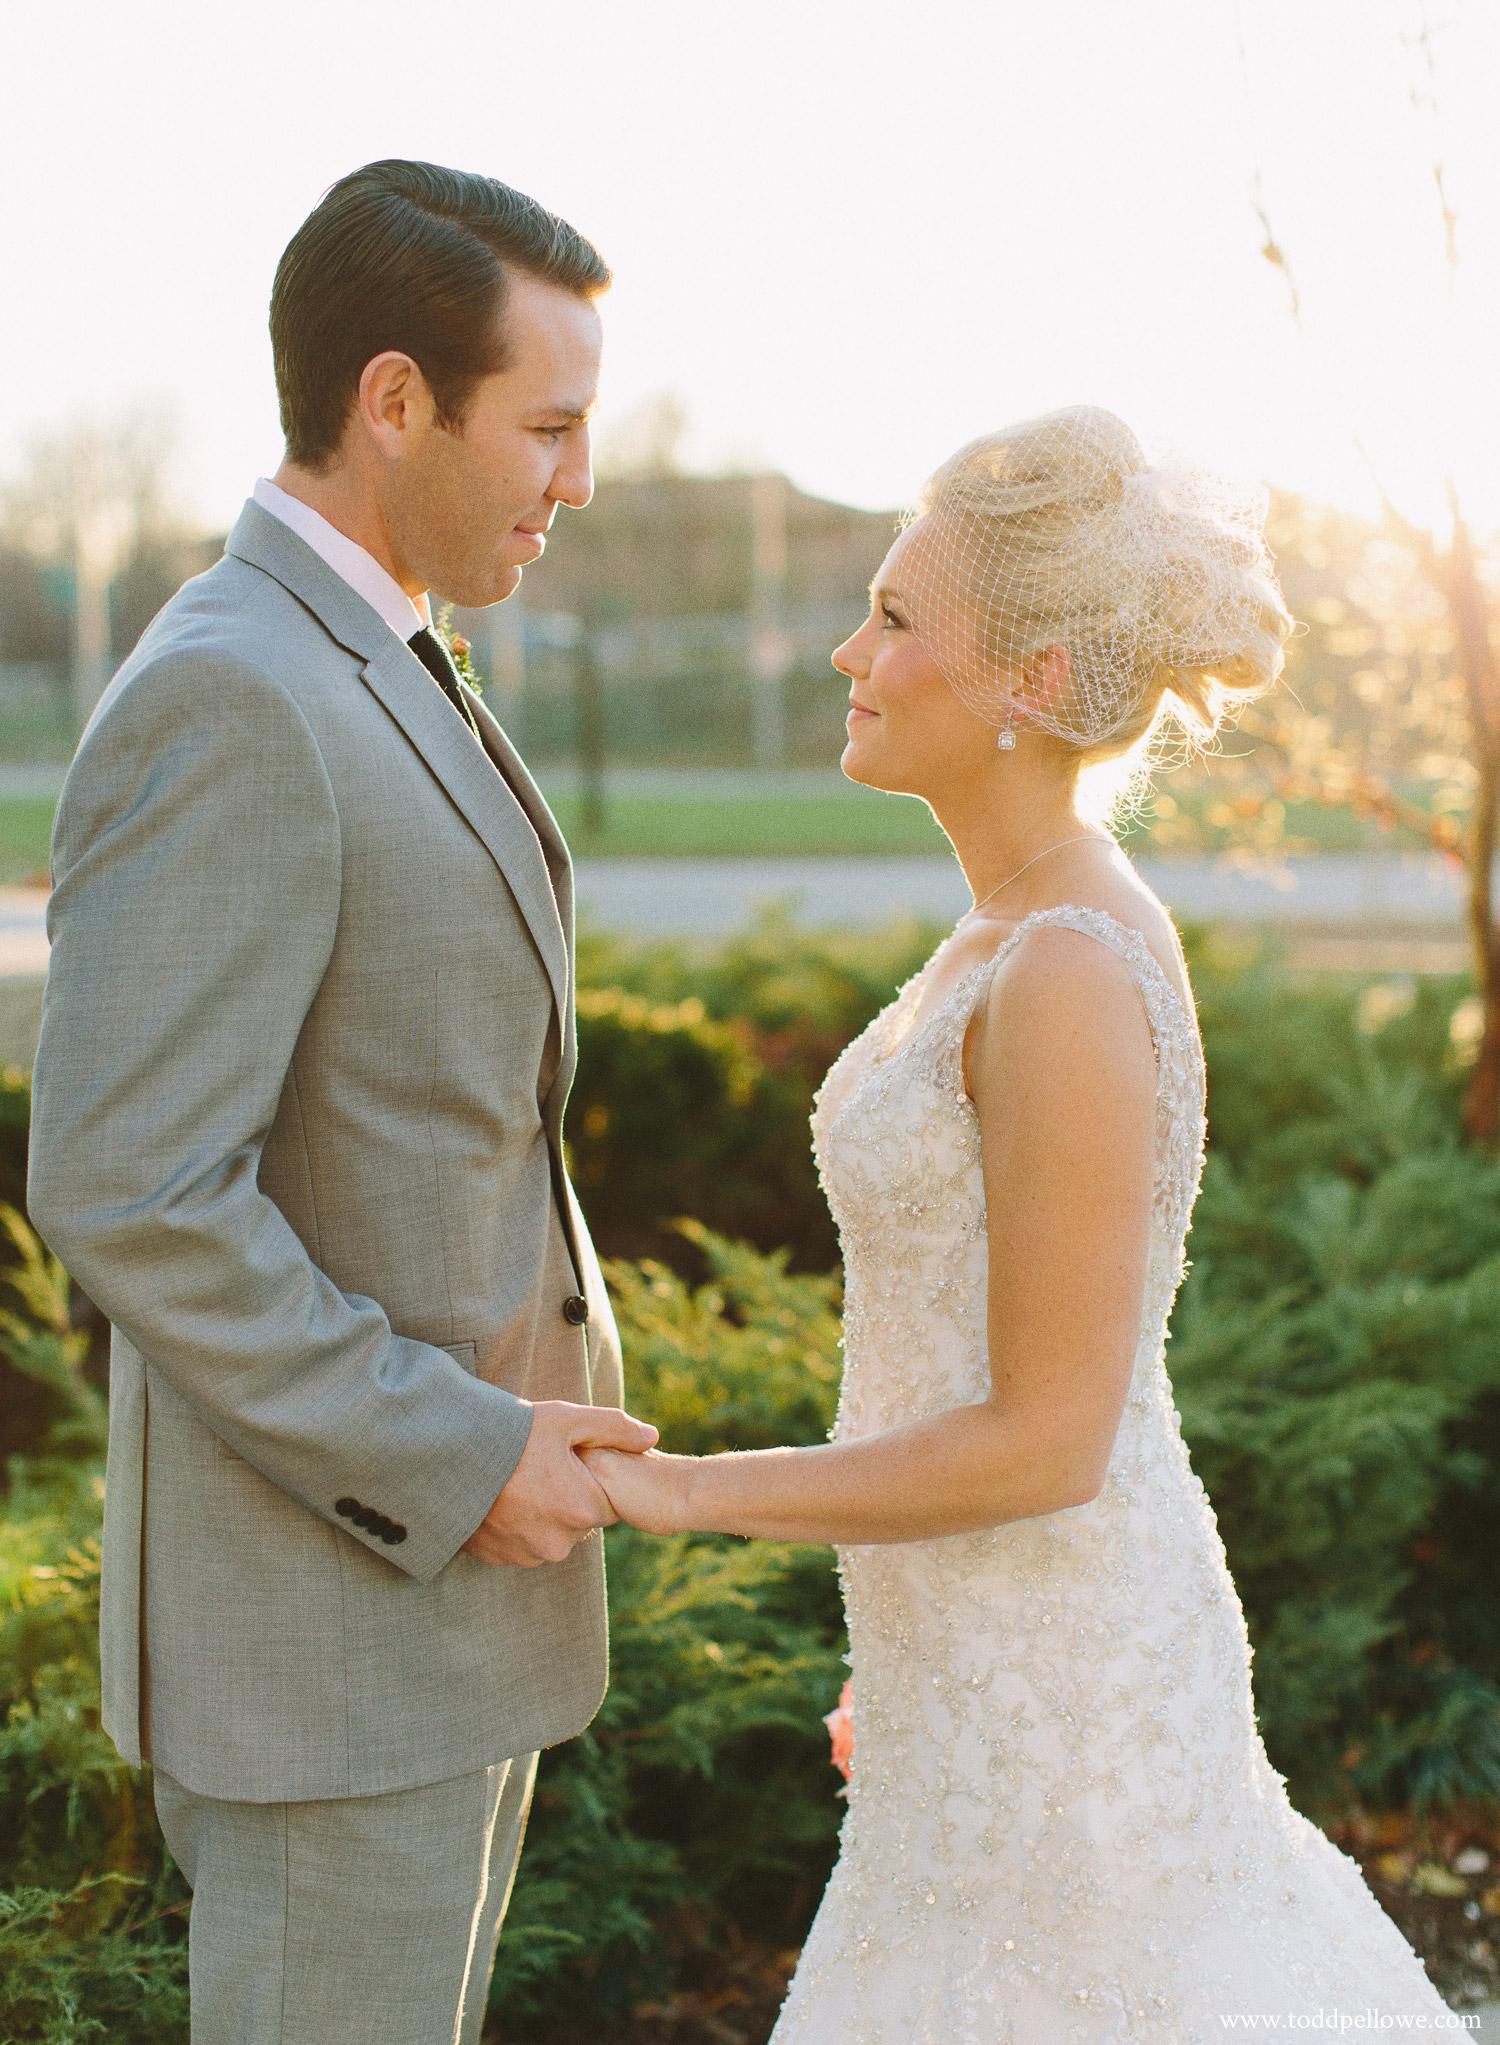 09-glassworks-wedding-photography-124.jpg